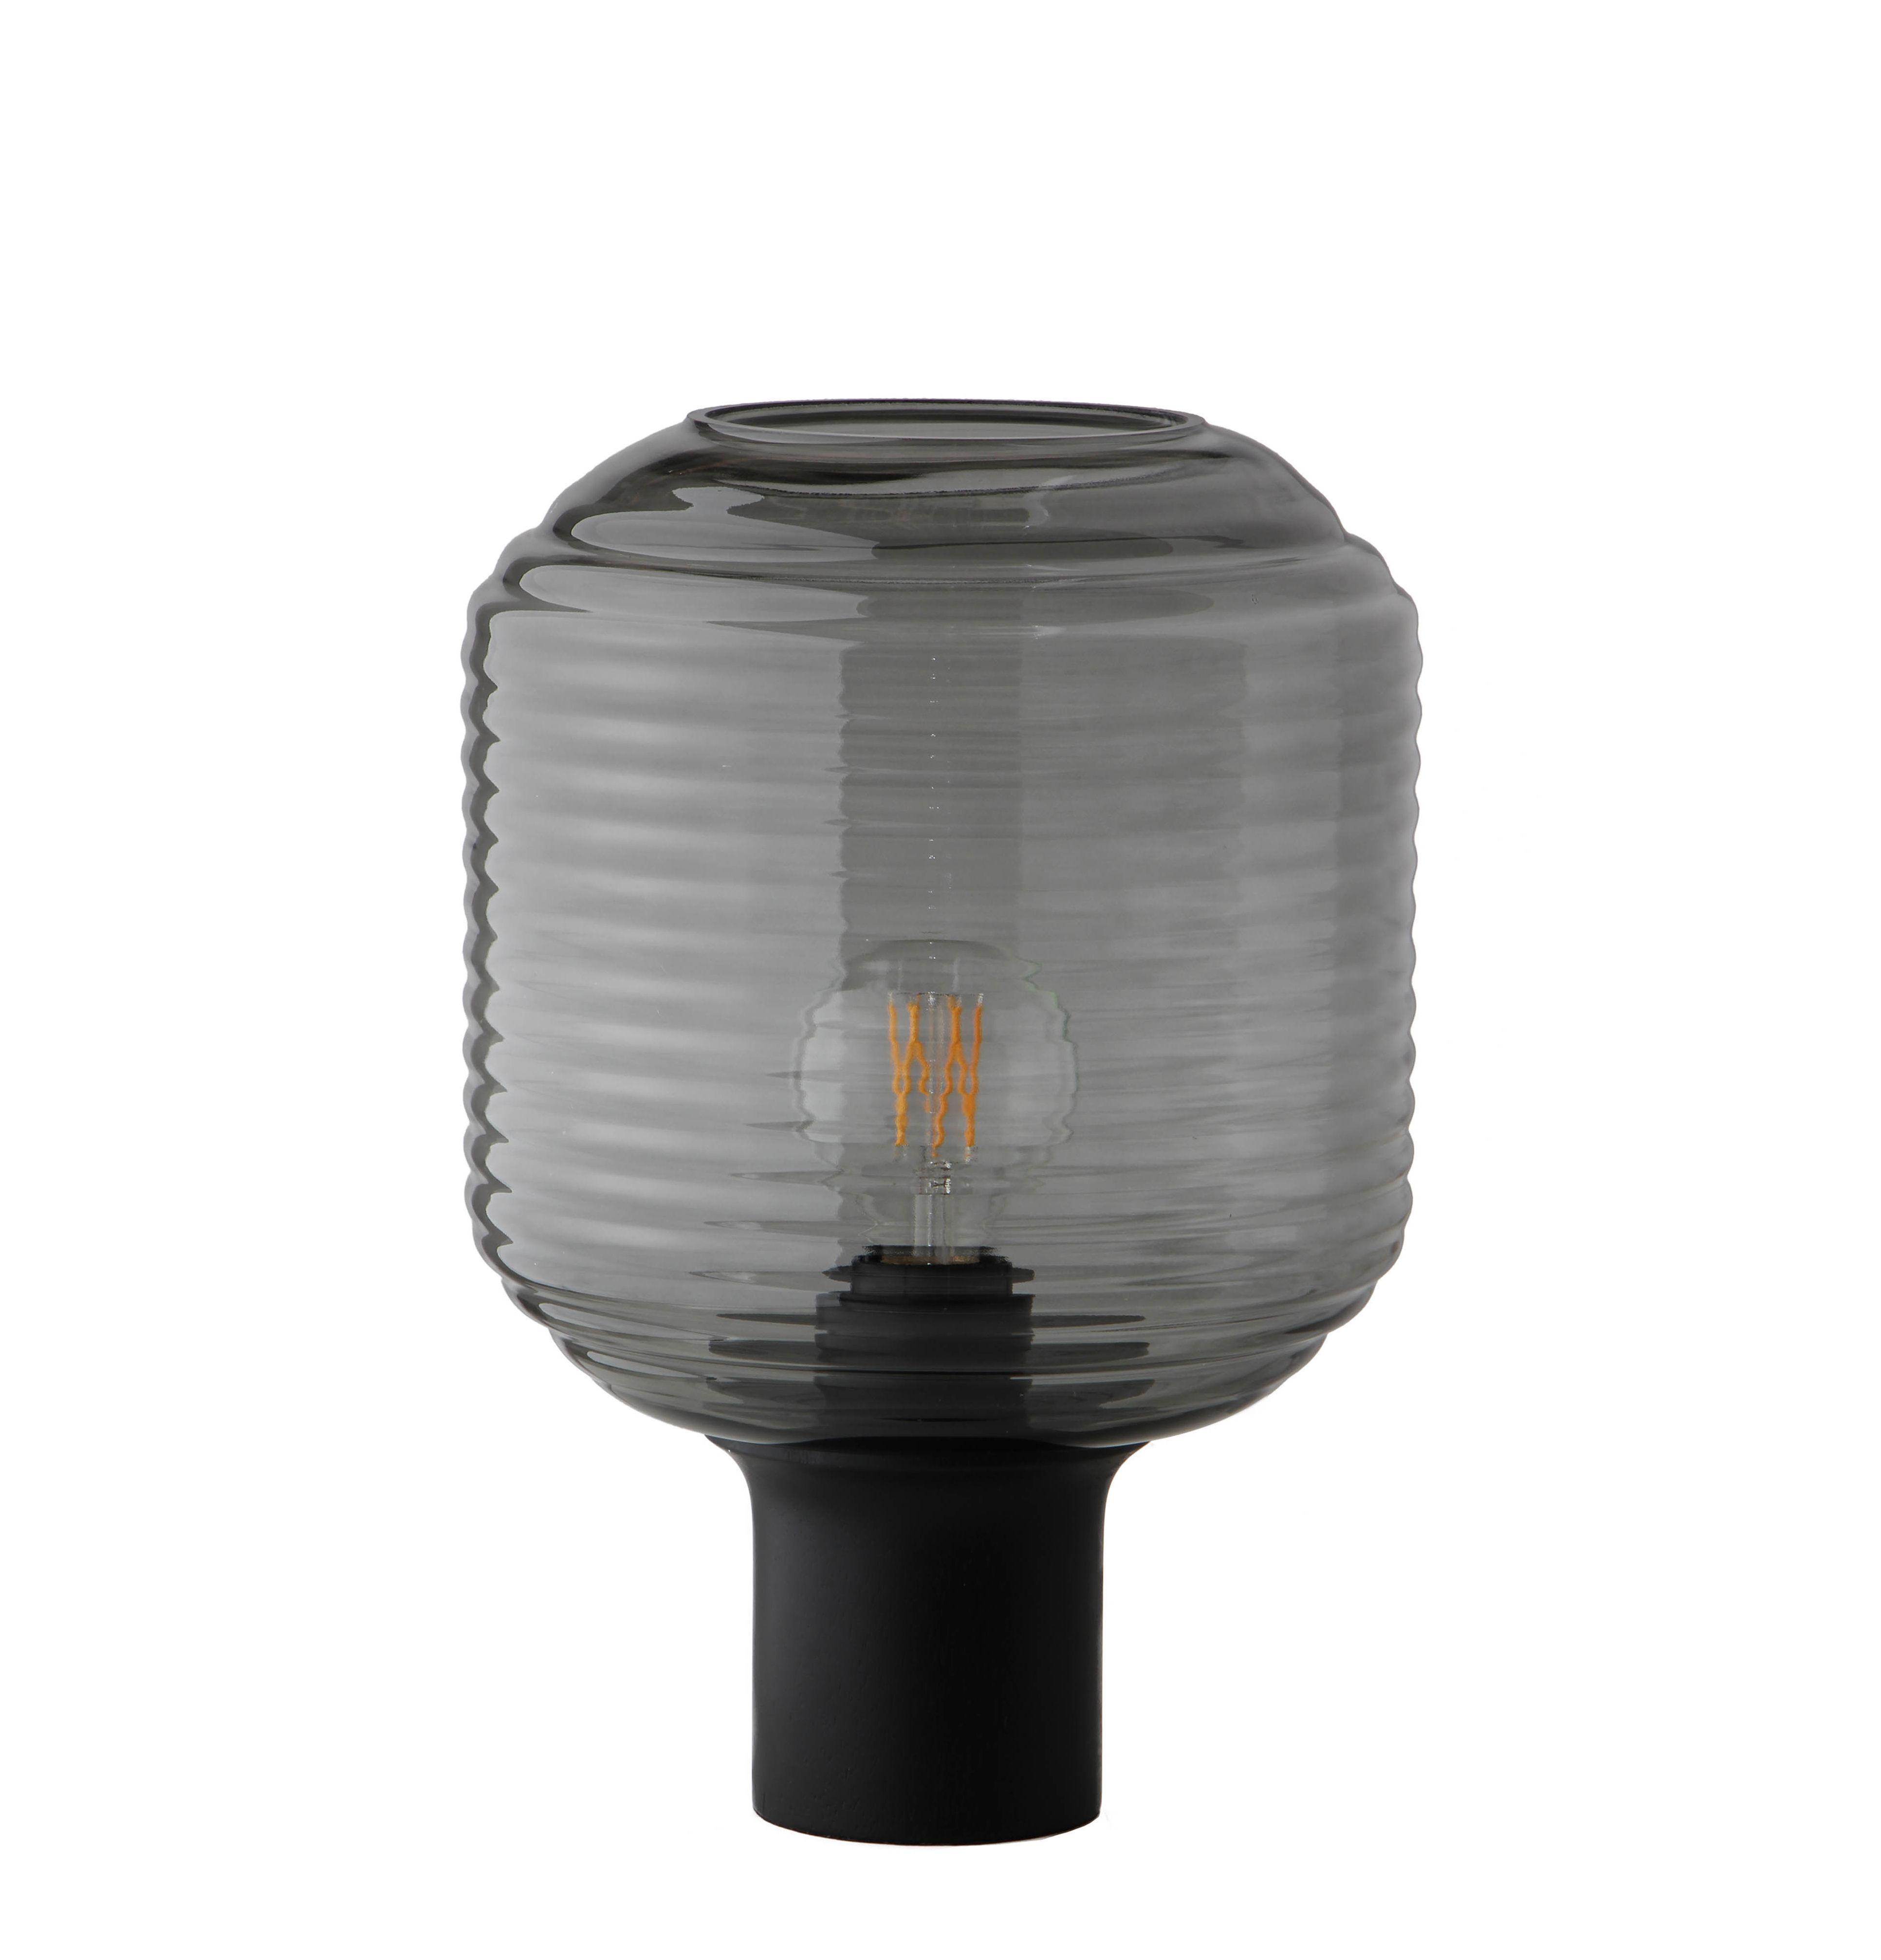 Lighting - Table Lamps - Honey Table lamp - / Glass & wood by Frandsen - Smoky grey / Black wood - Bois d'hévéa teinté, Glass